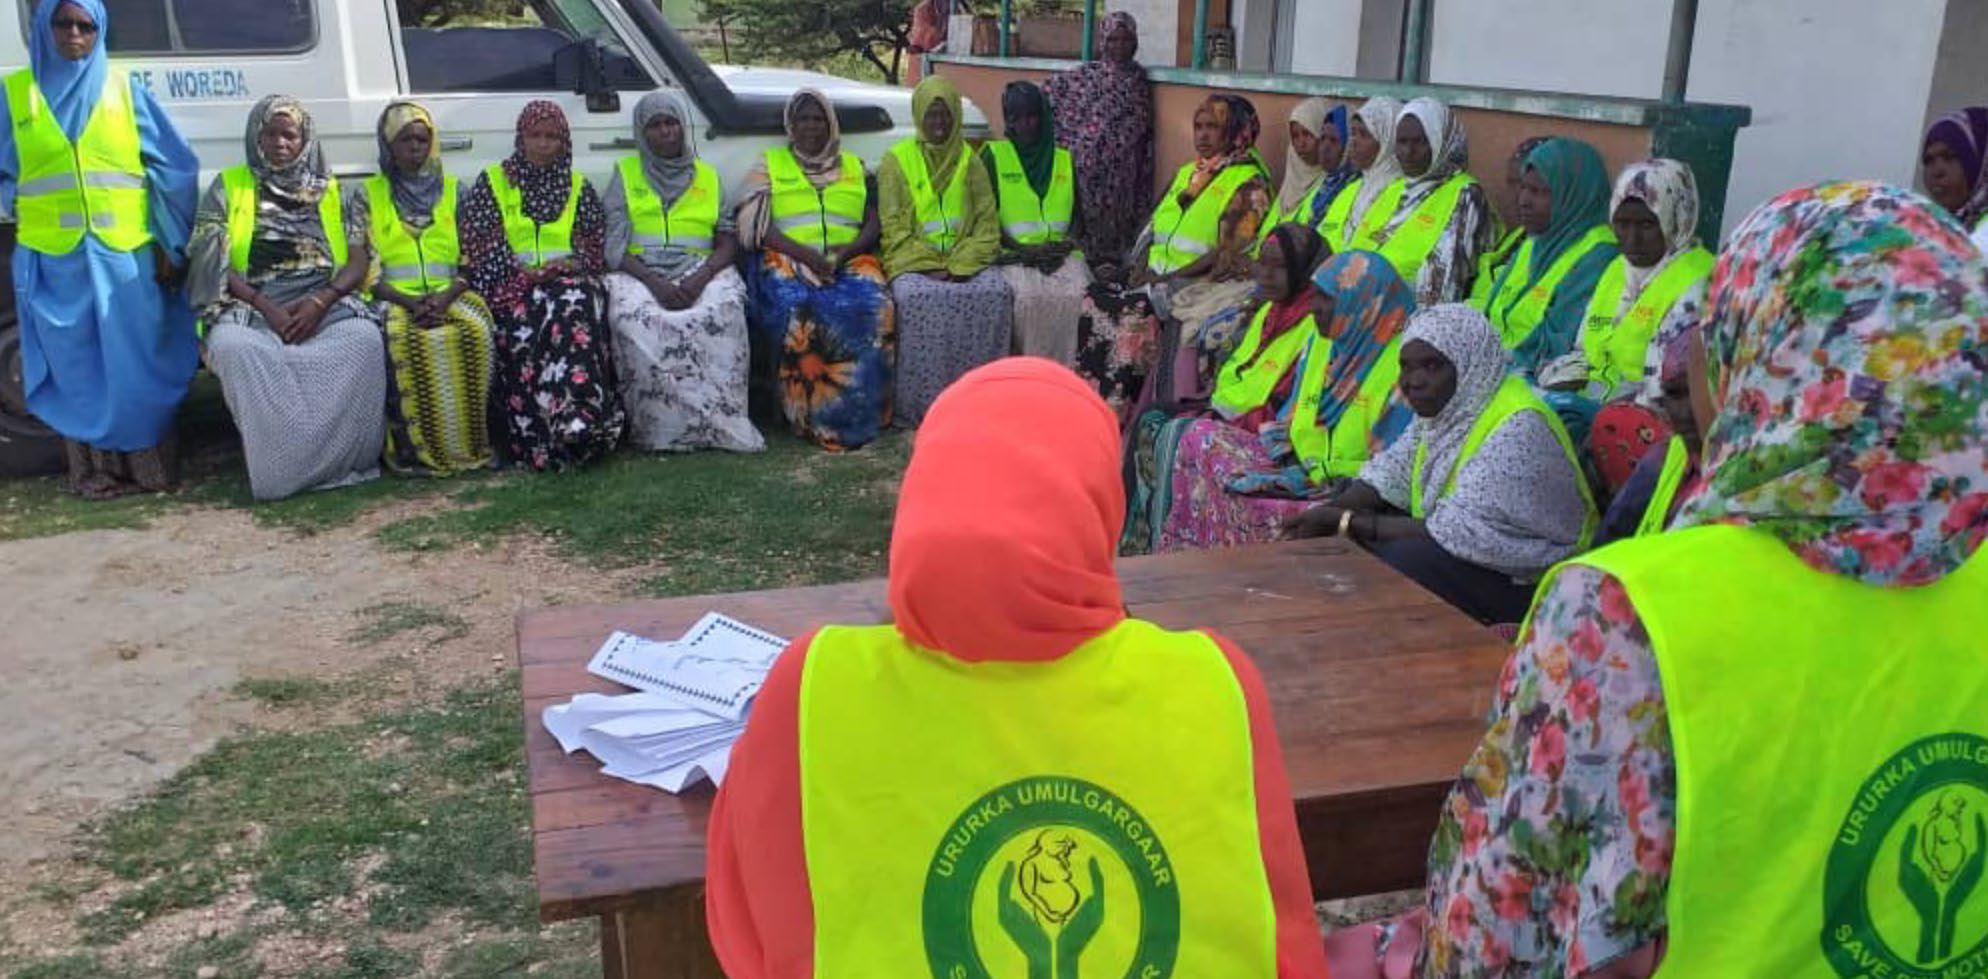 Members of Umulgargar, a Community Based Association (CBA) in Awbare Woreda, Somali Region